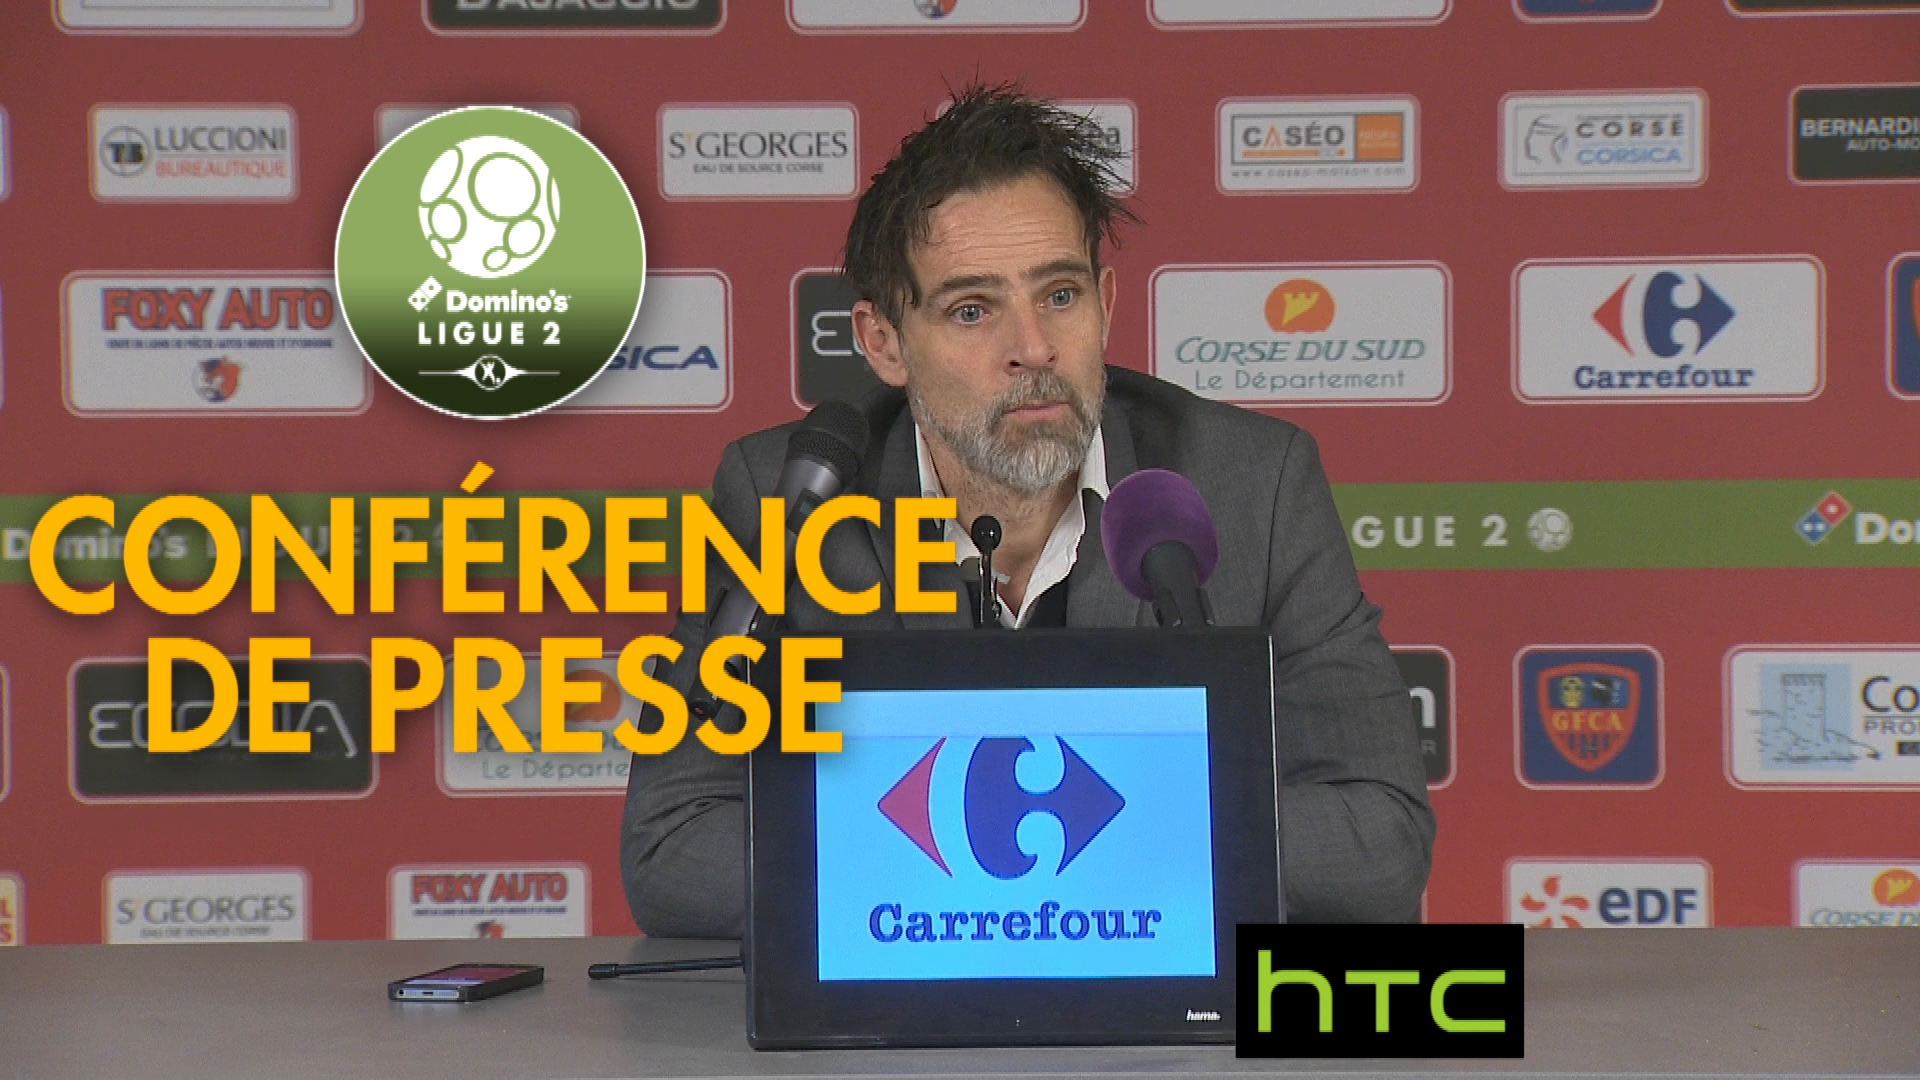 Conférence de presse Gazélec FC Ajaccio – Stade Lavallois (1-1) : Jean-Luc VANNUCHI (GFCA) – Marco SIMONE (LAVAL) – 2016/2017